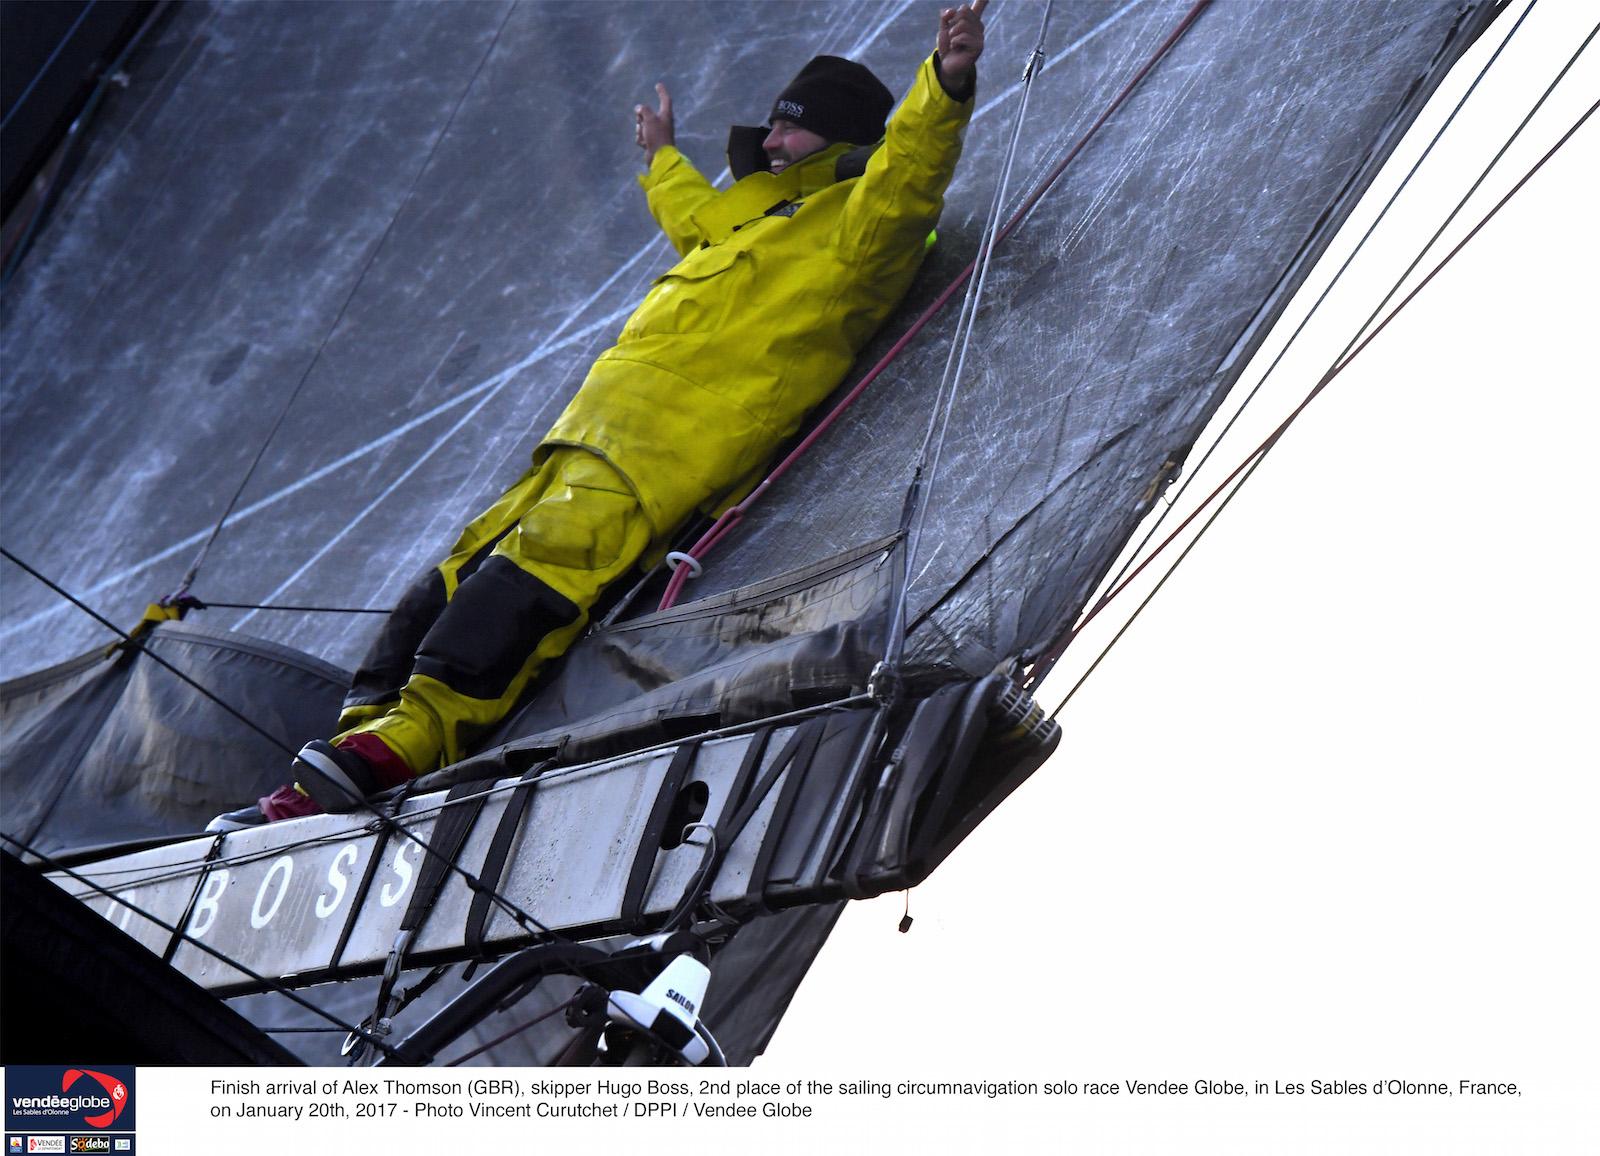 Alex Thomson at the finish of the Vendee Globe. Photo Vincent Curutchet/DPPI/Vendee Globe